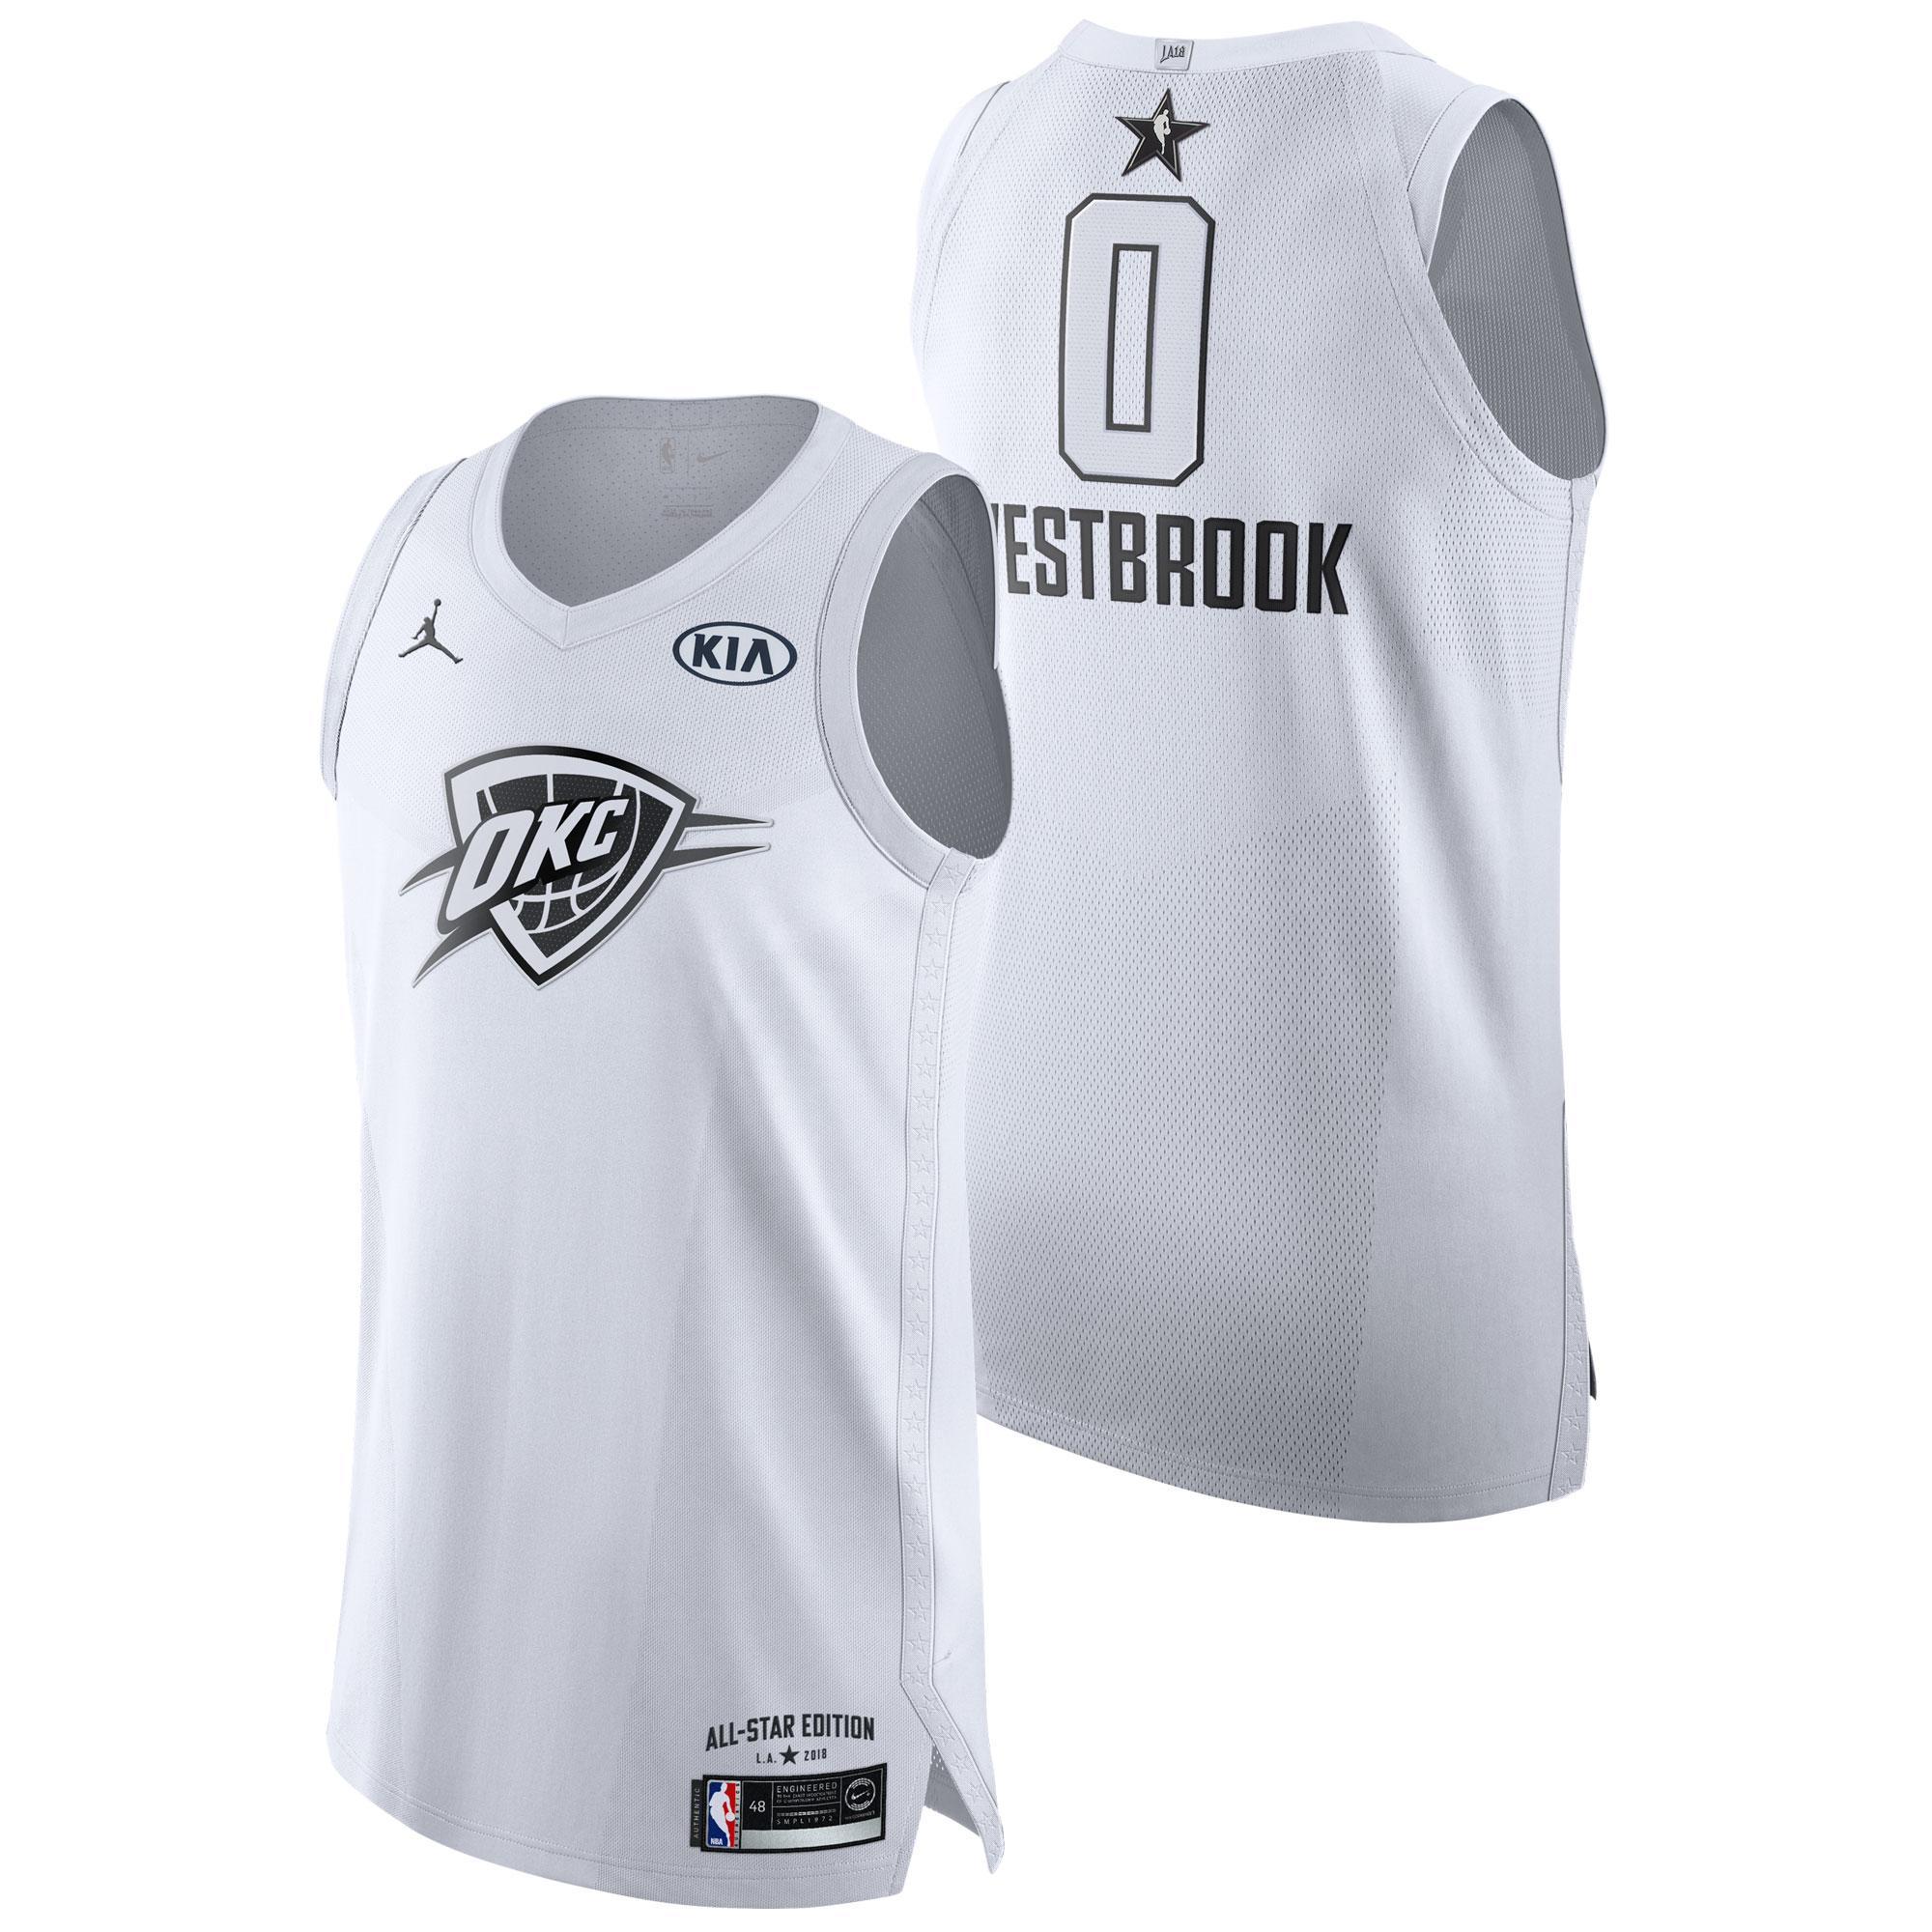 Camiseta NBA All-Star 2018 Jordan Blanco Authentic - Russell Westbrook - Hombre